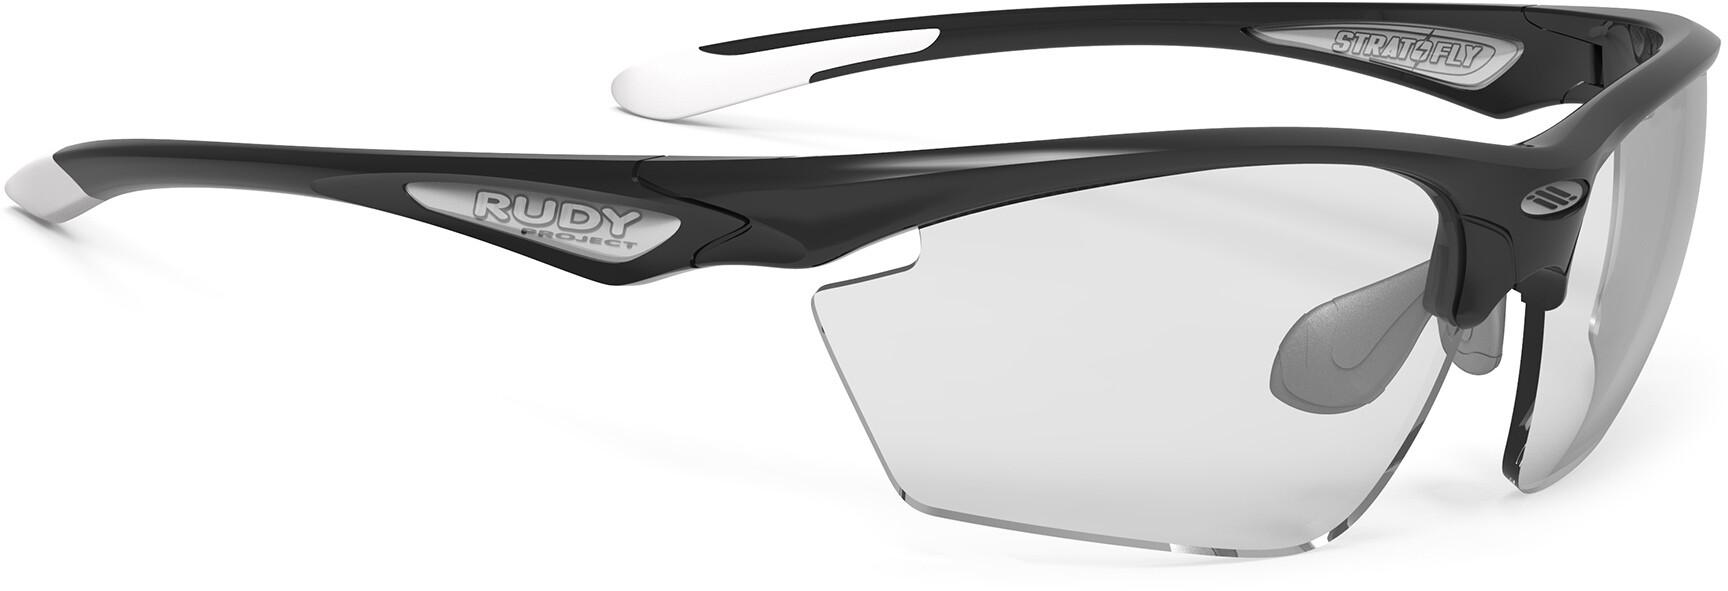 Rudy Project Stratofly Cykelbriller, black gloss - impactx photochromic 2 black | Briller